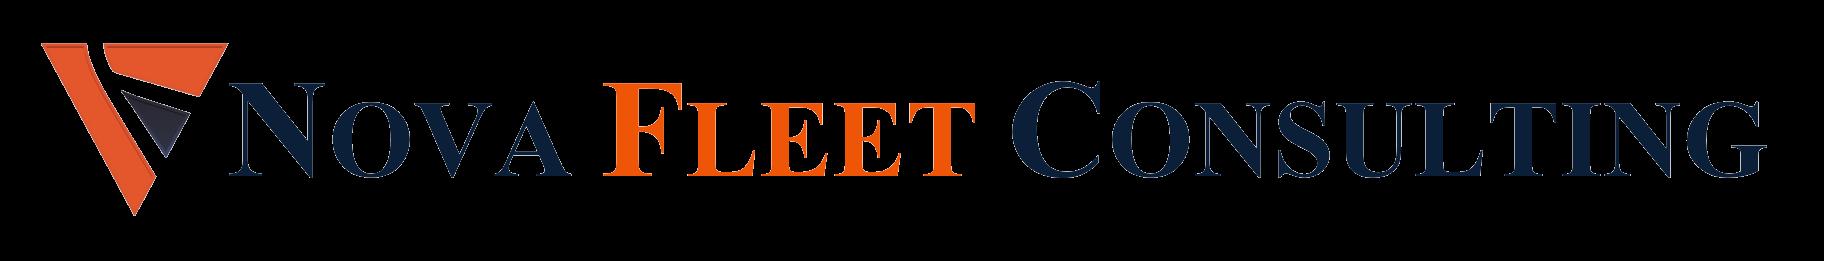 Nova Fleet Consulting